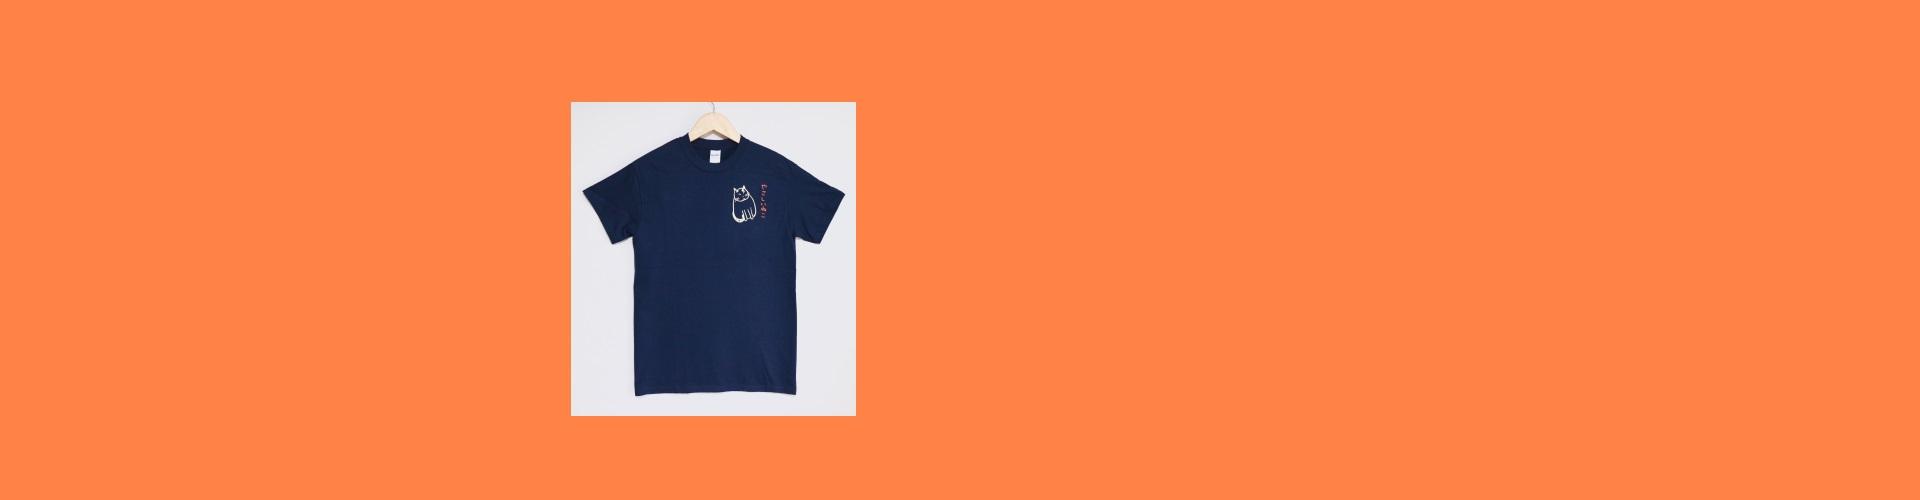 Tシャツ通販開始